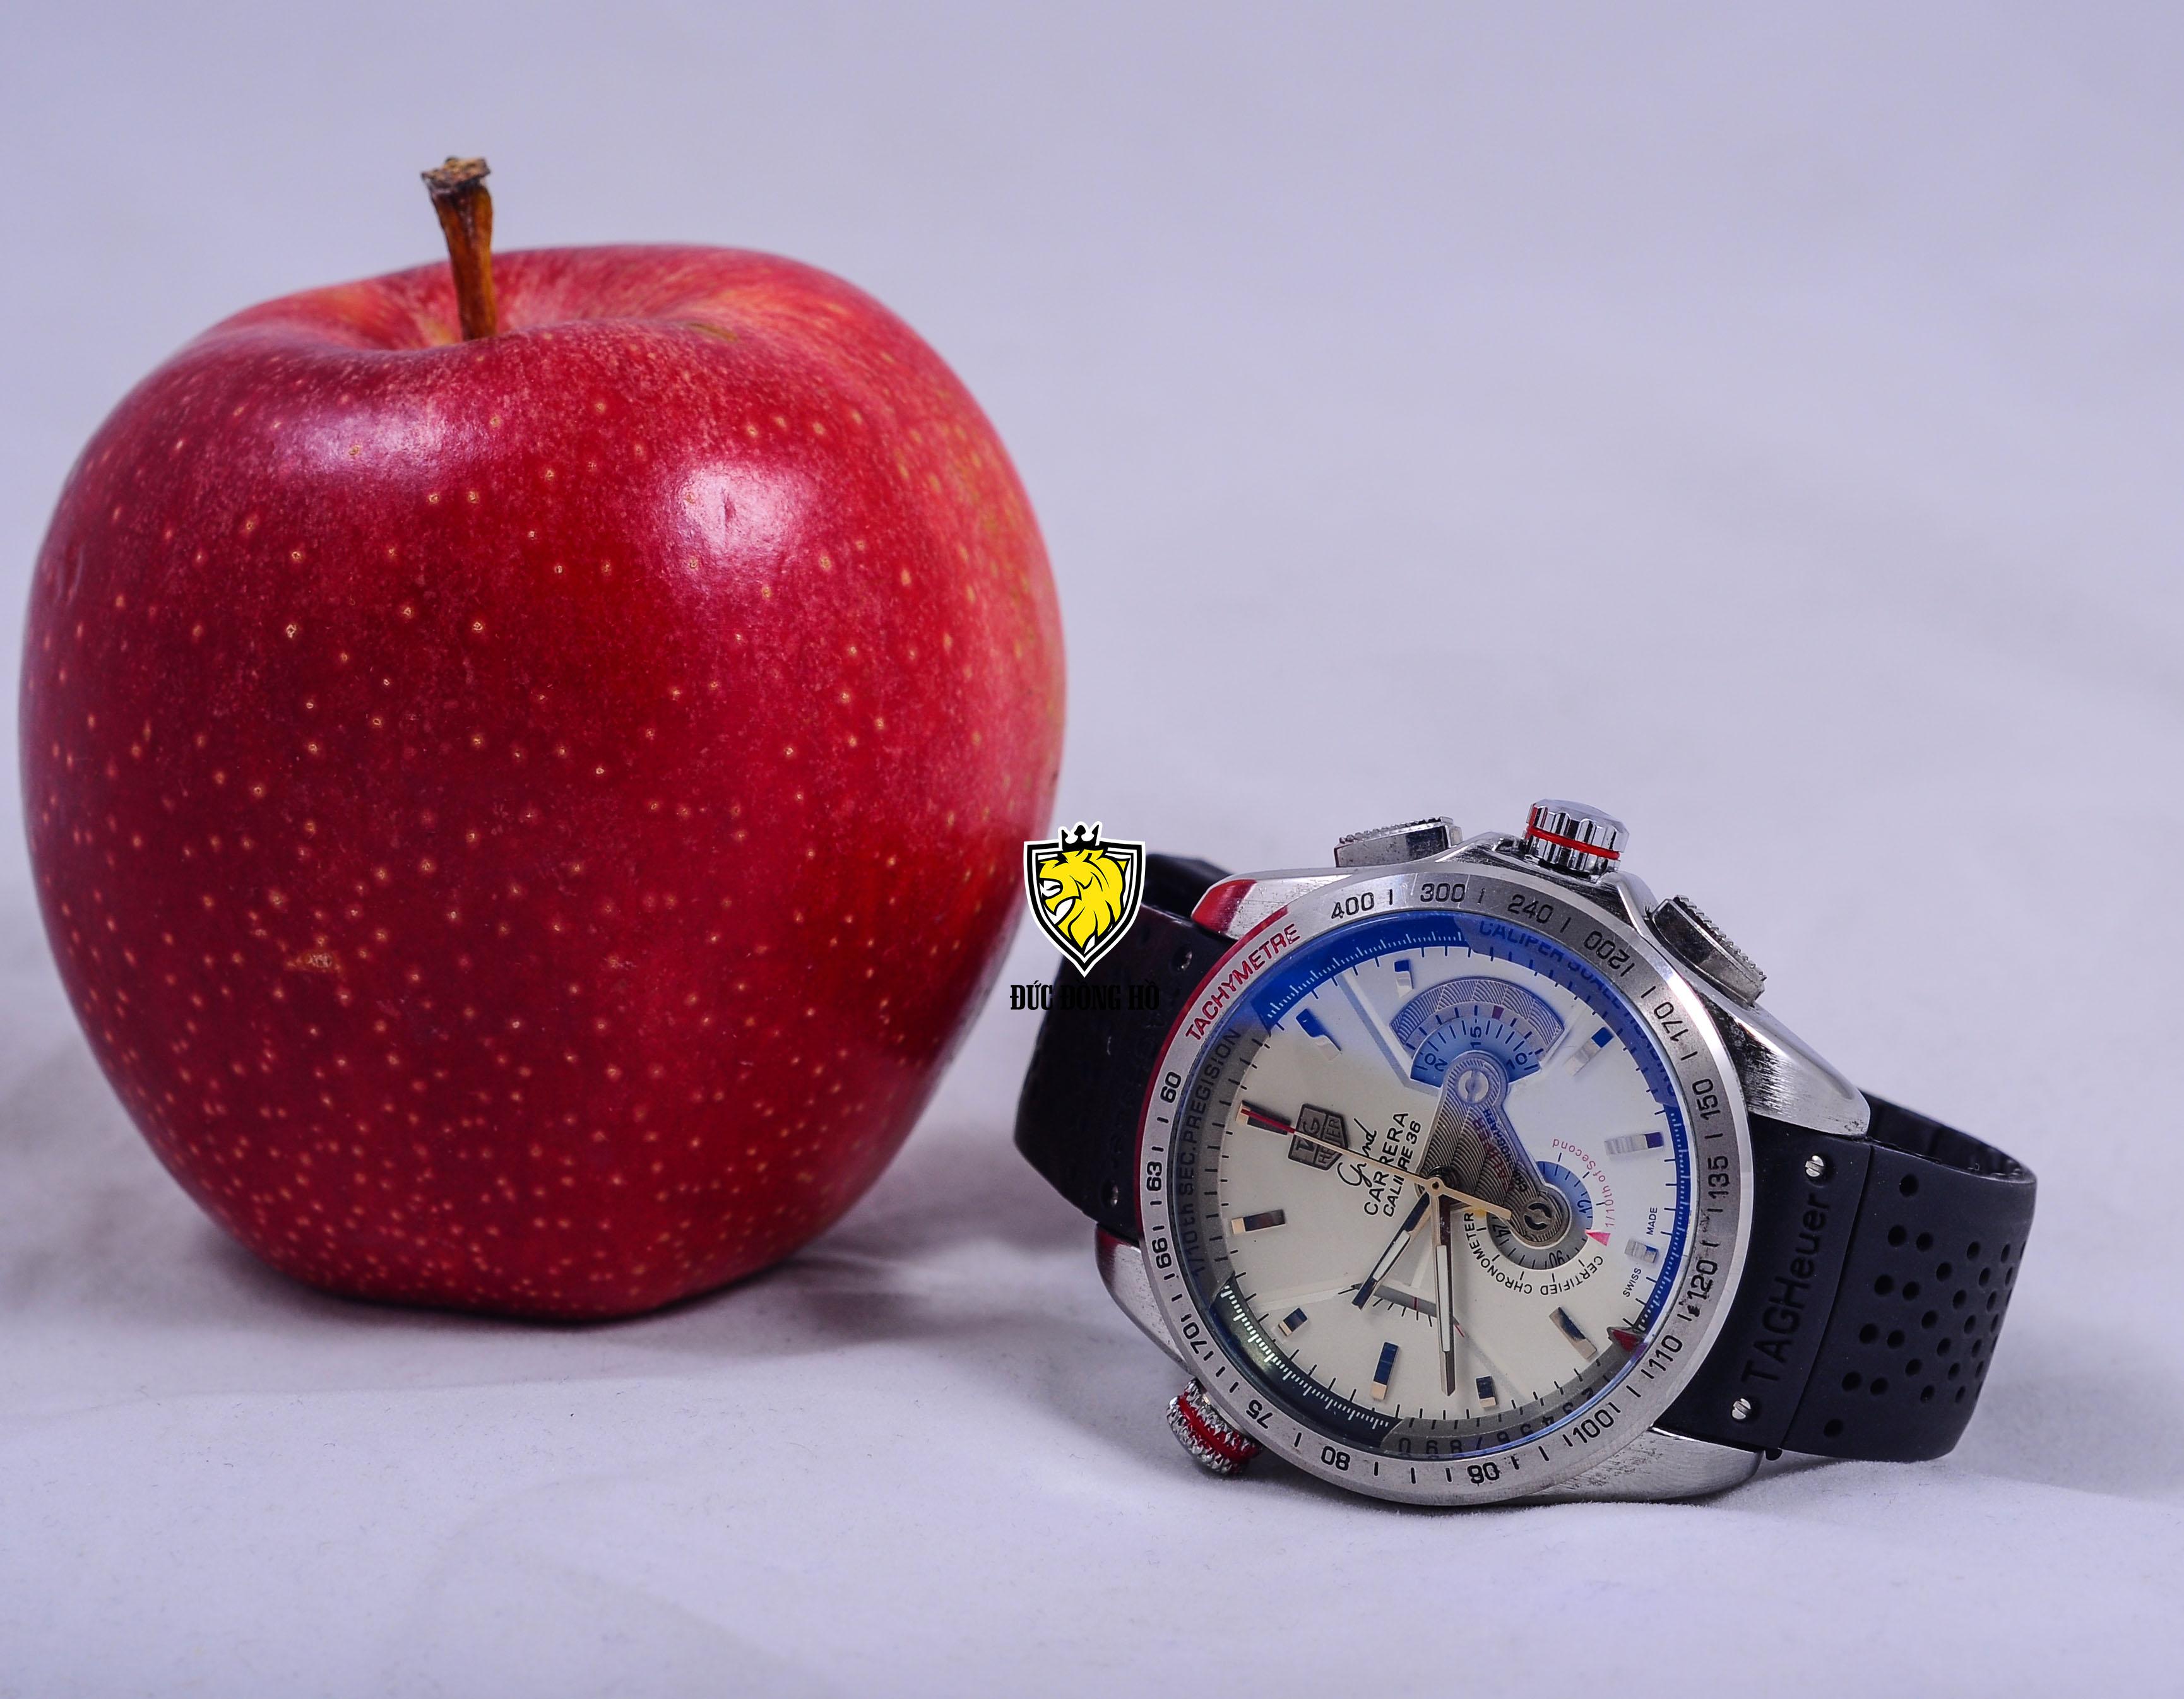 Đồng hồ Tag Heuer Nam 114.2